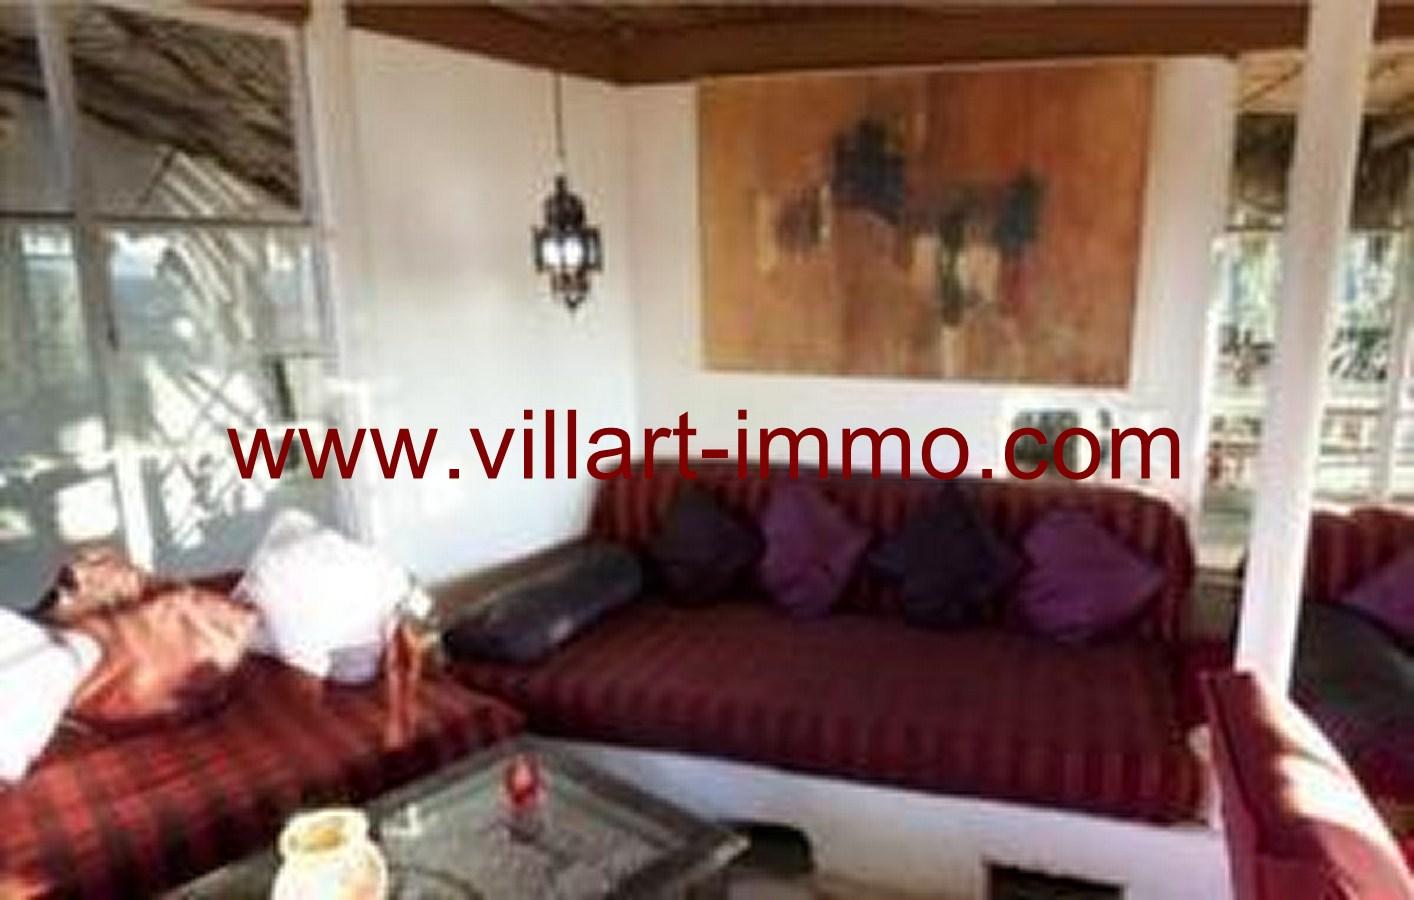 4-Vente-Riad-Assilah-Autres-Salon 3-VR92-Villart Immo